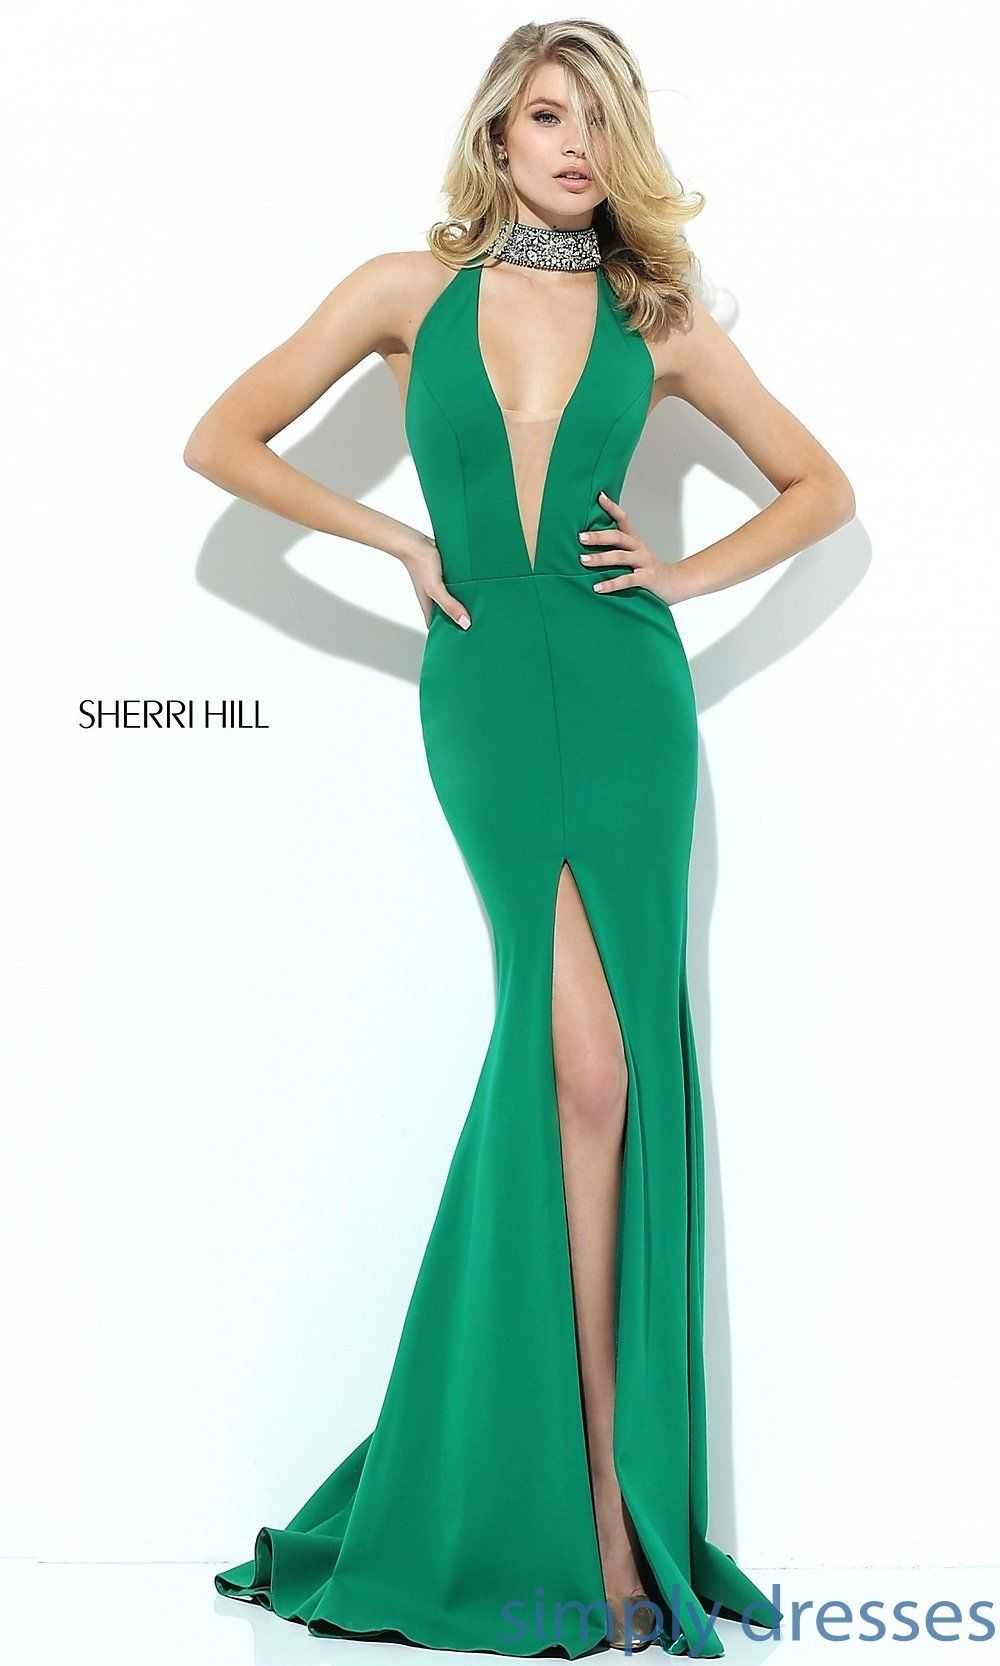 Sh sherri hill dress with front slit dress formal formal